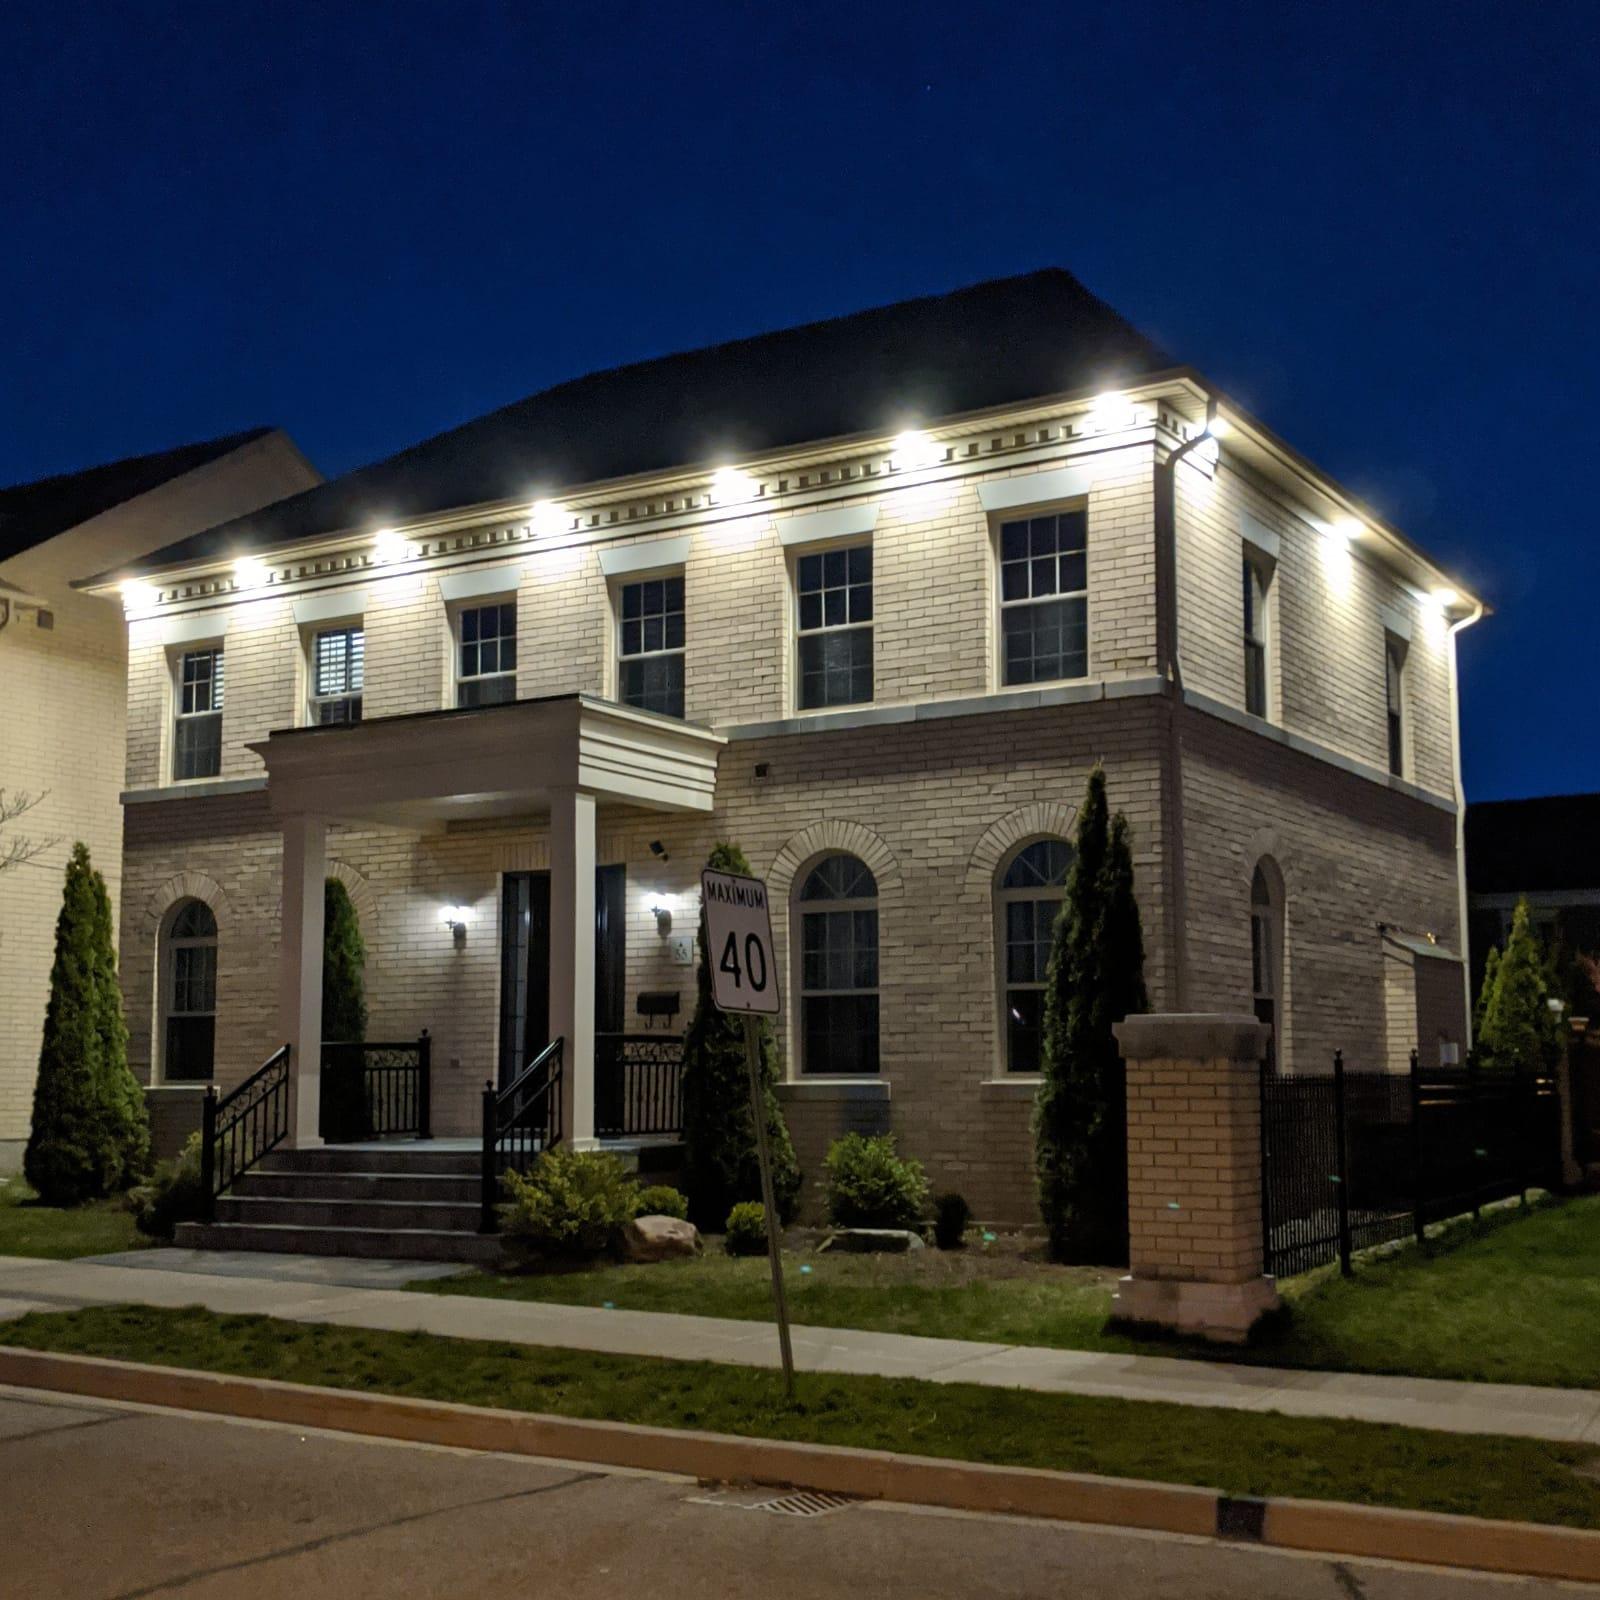 custom home with exterior potlights